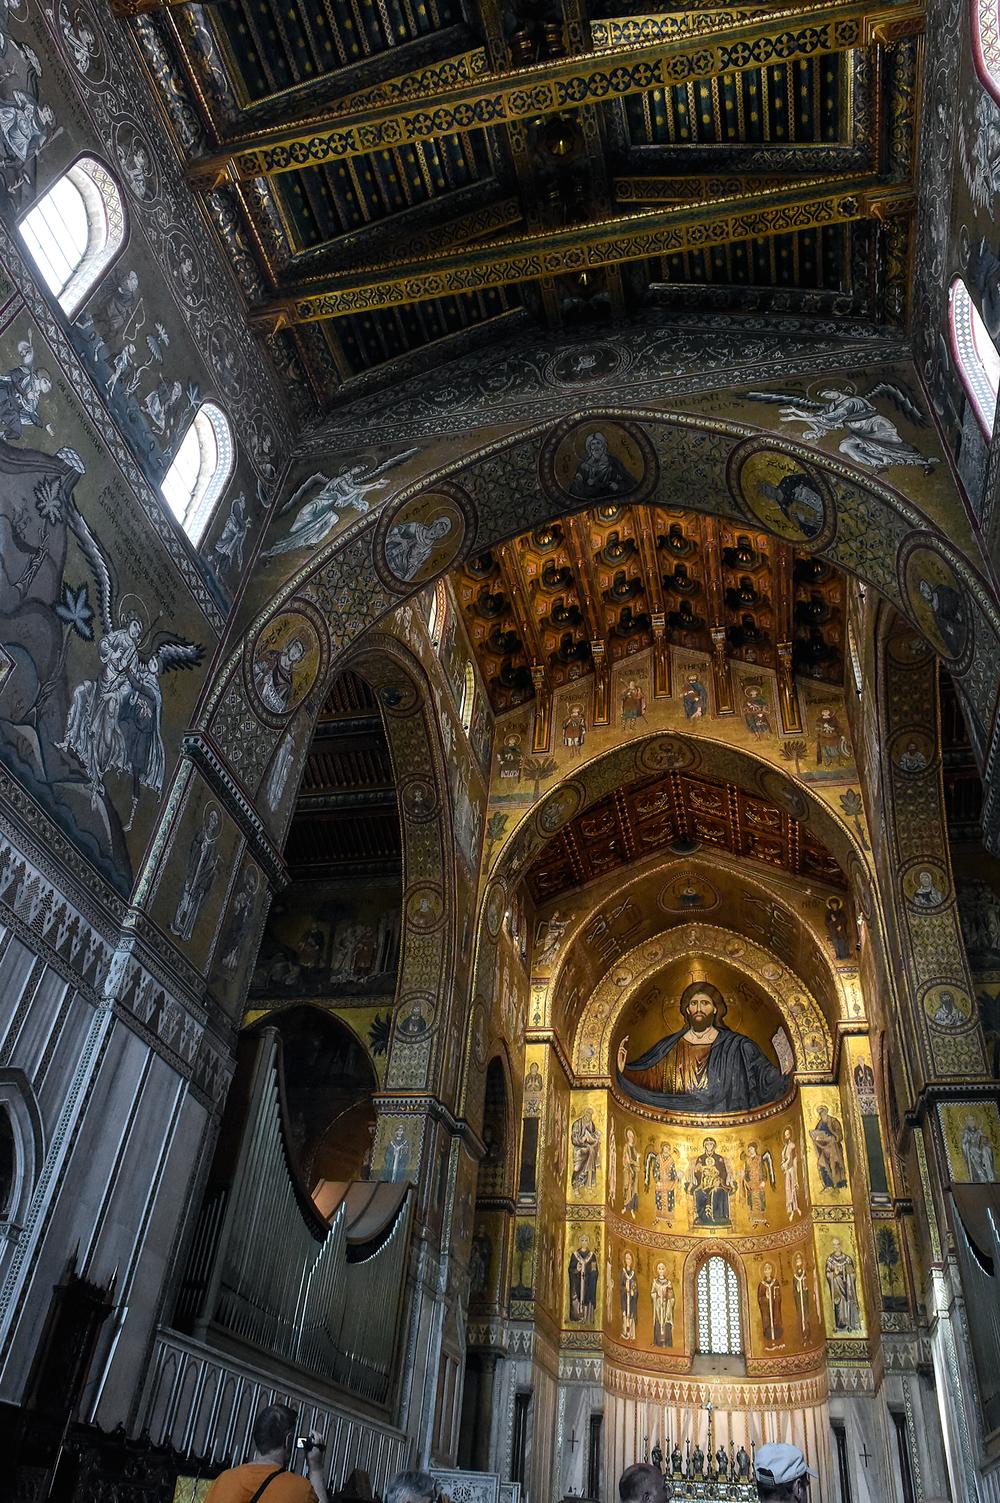 monreale cathedralhttps://en.wikipedia.org/wiki/Monreale